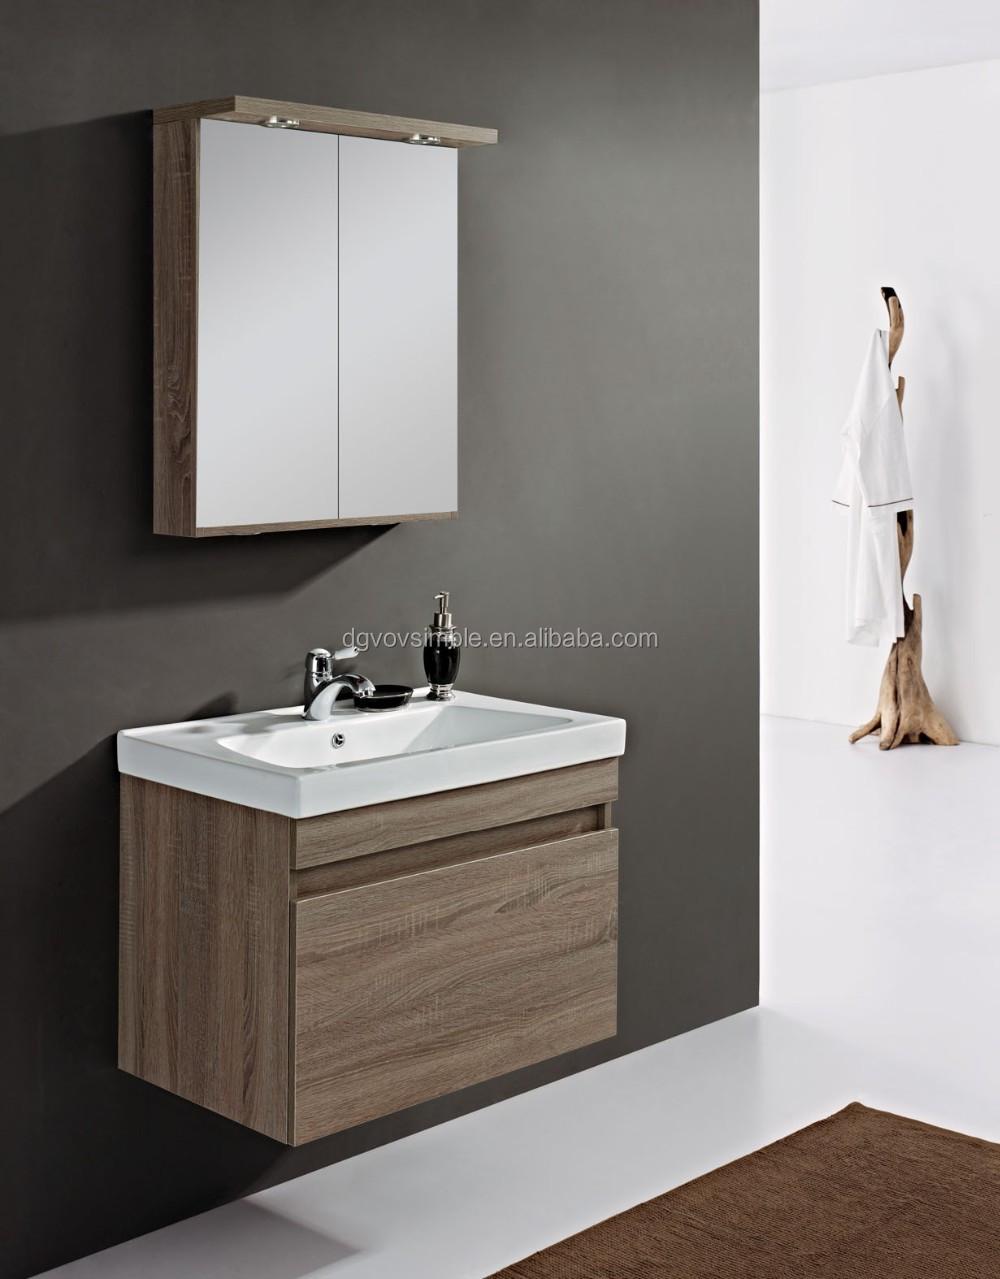 Used Bathroom Vanity Cabinets Centerset Bathroom Faucets